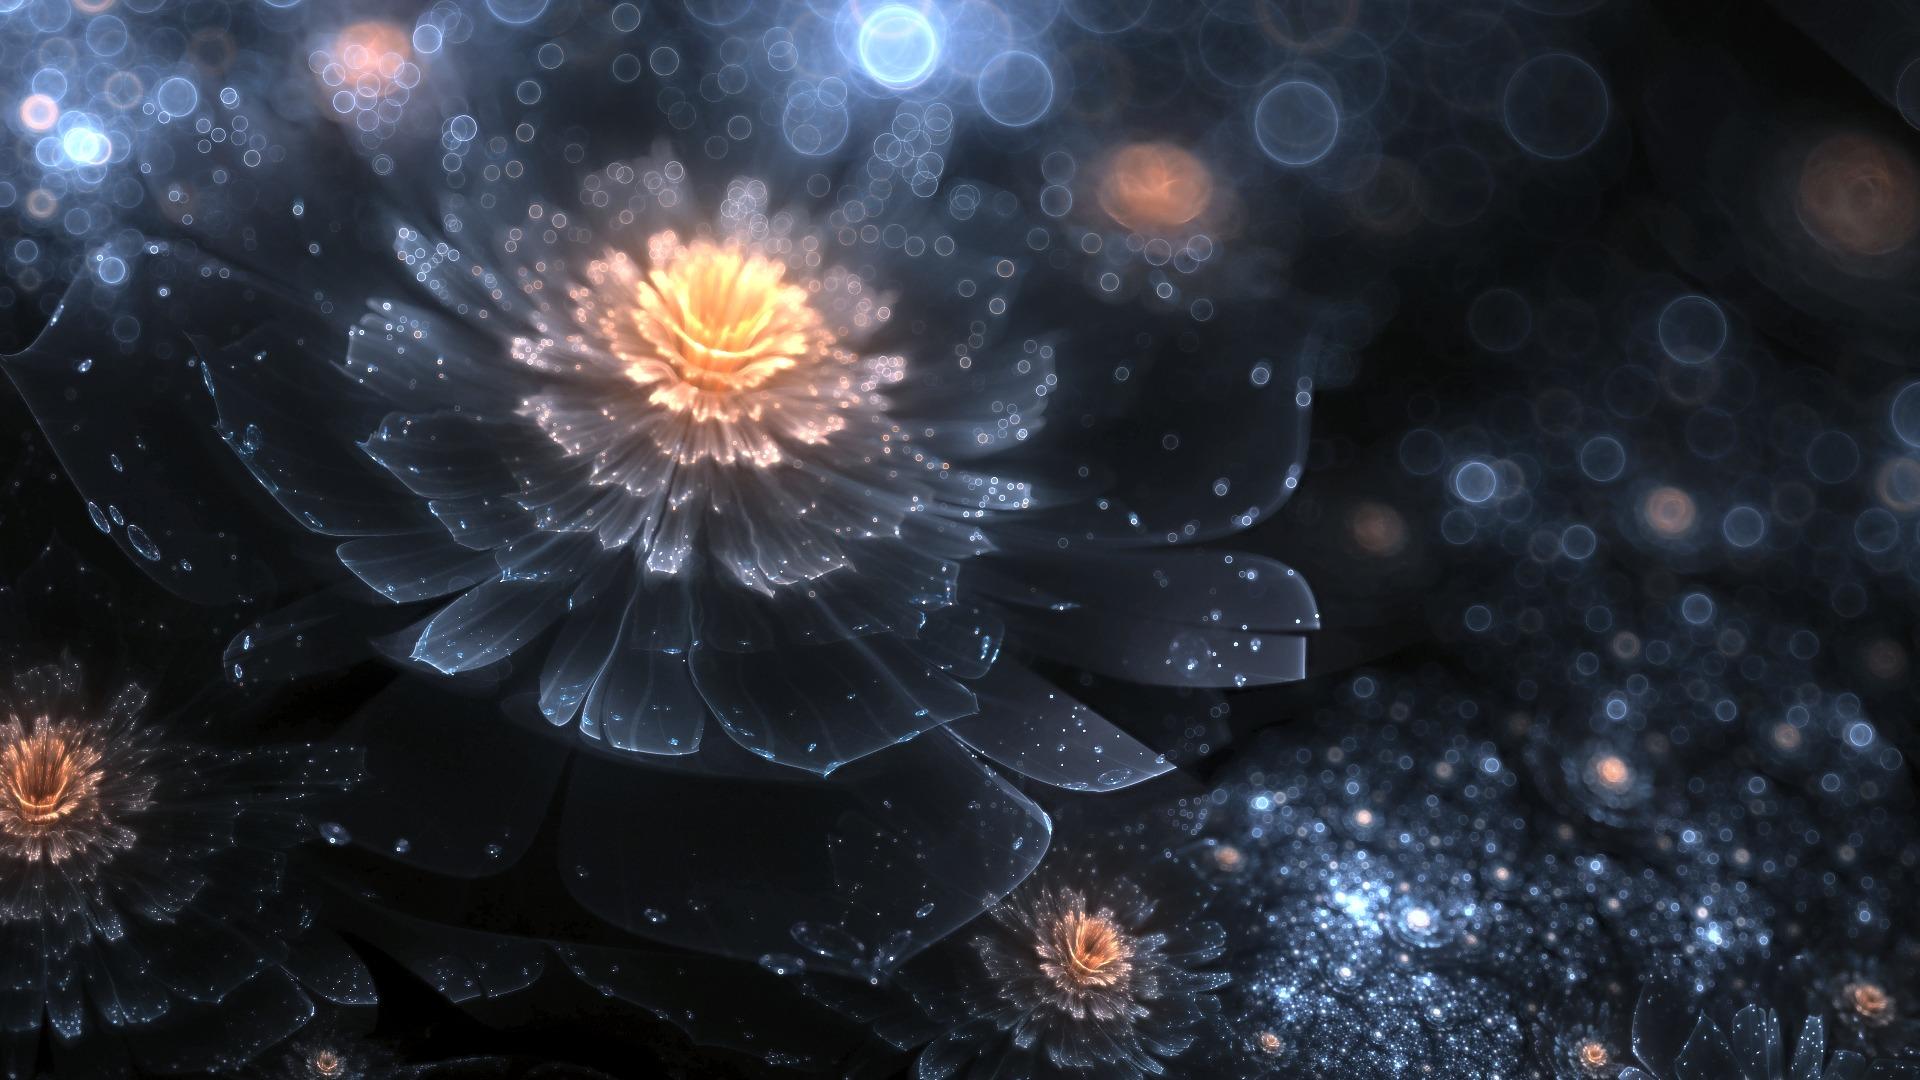 night-divine-flower-art-noch.jpg